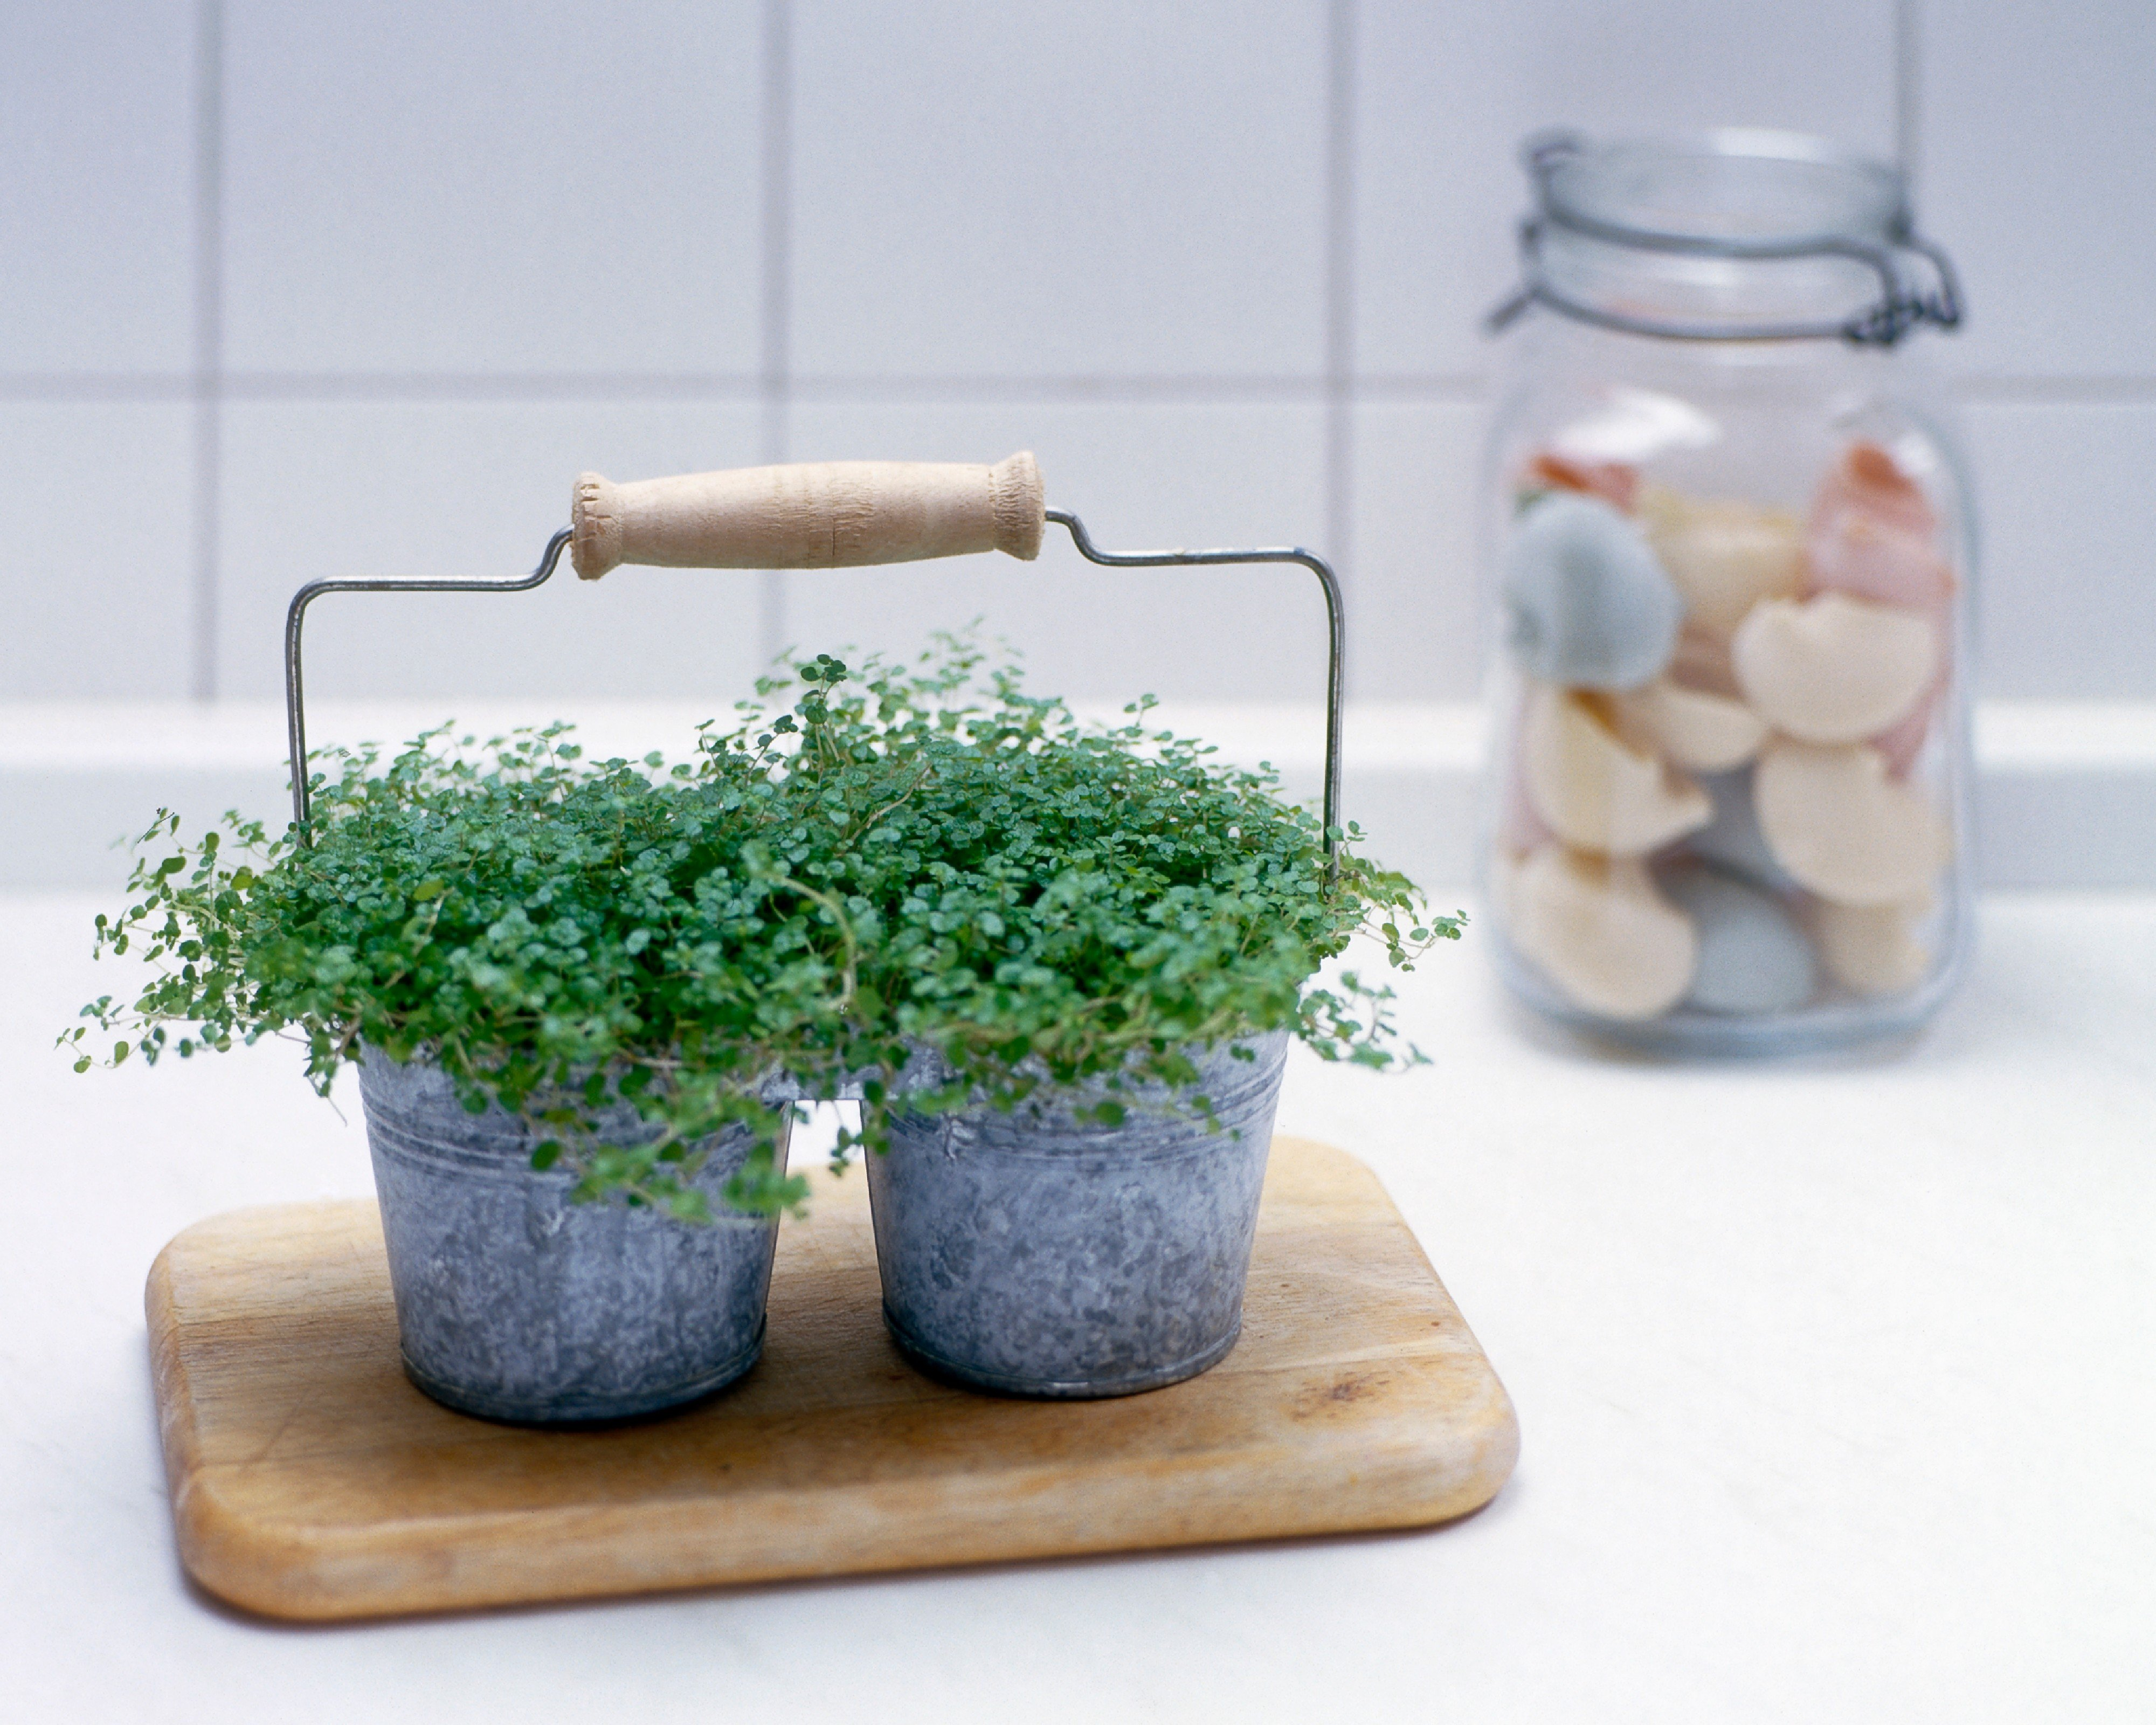 Irish-moss in an informal kitchen setting